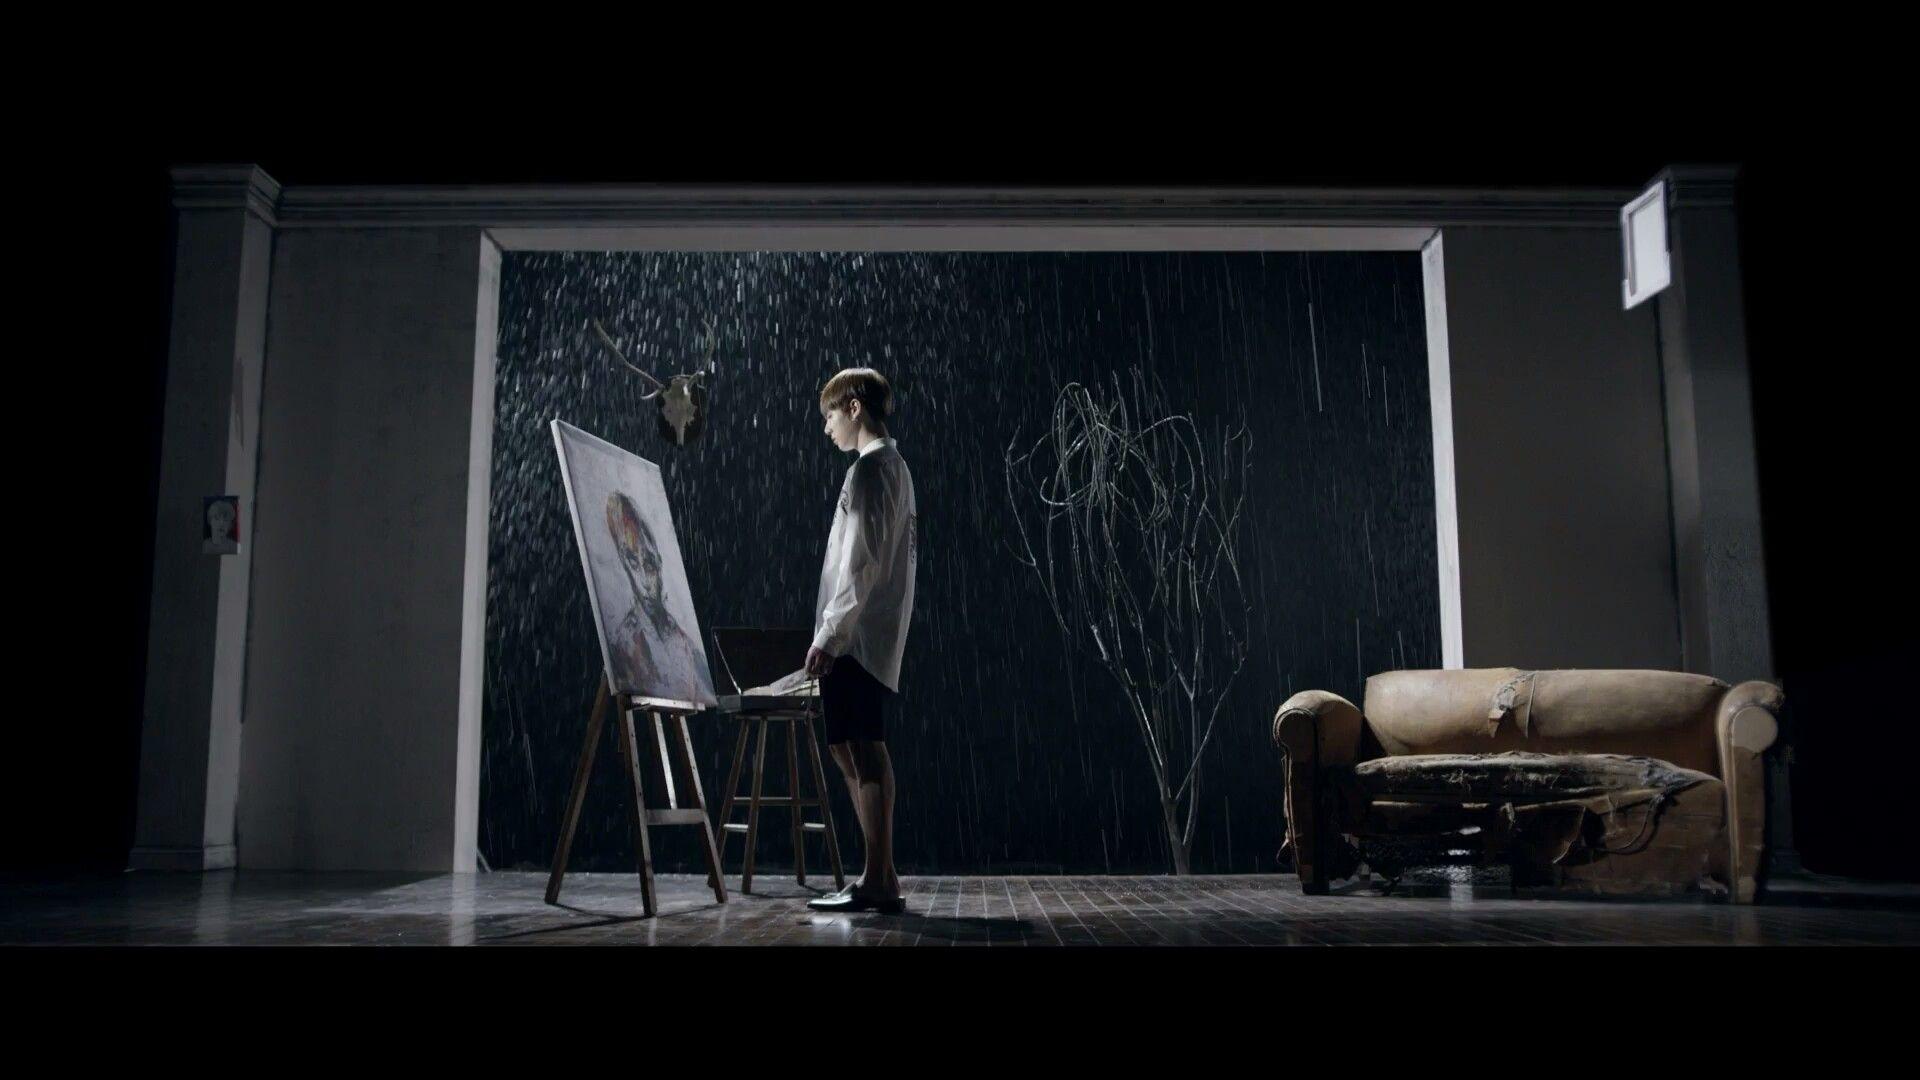 Jungkook ❤ BTS(방탄소년단) WINGS Short Film #1 BEGIN #BTS #방탄소년단